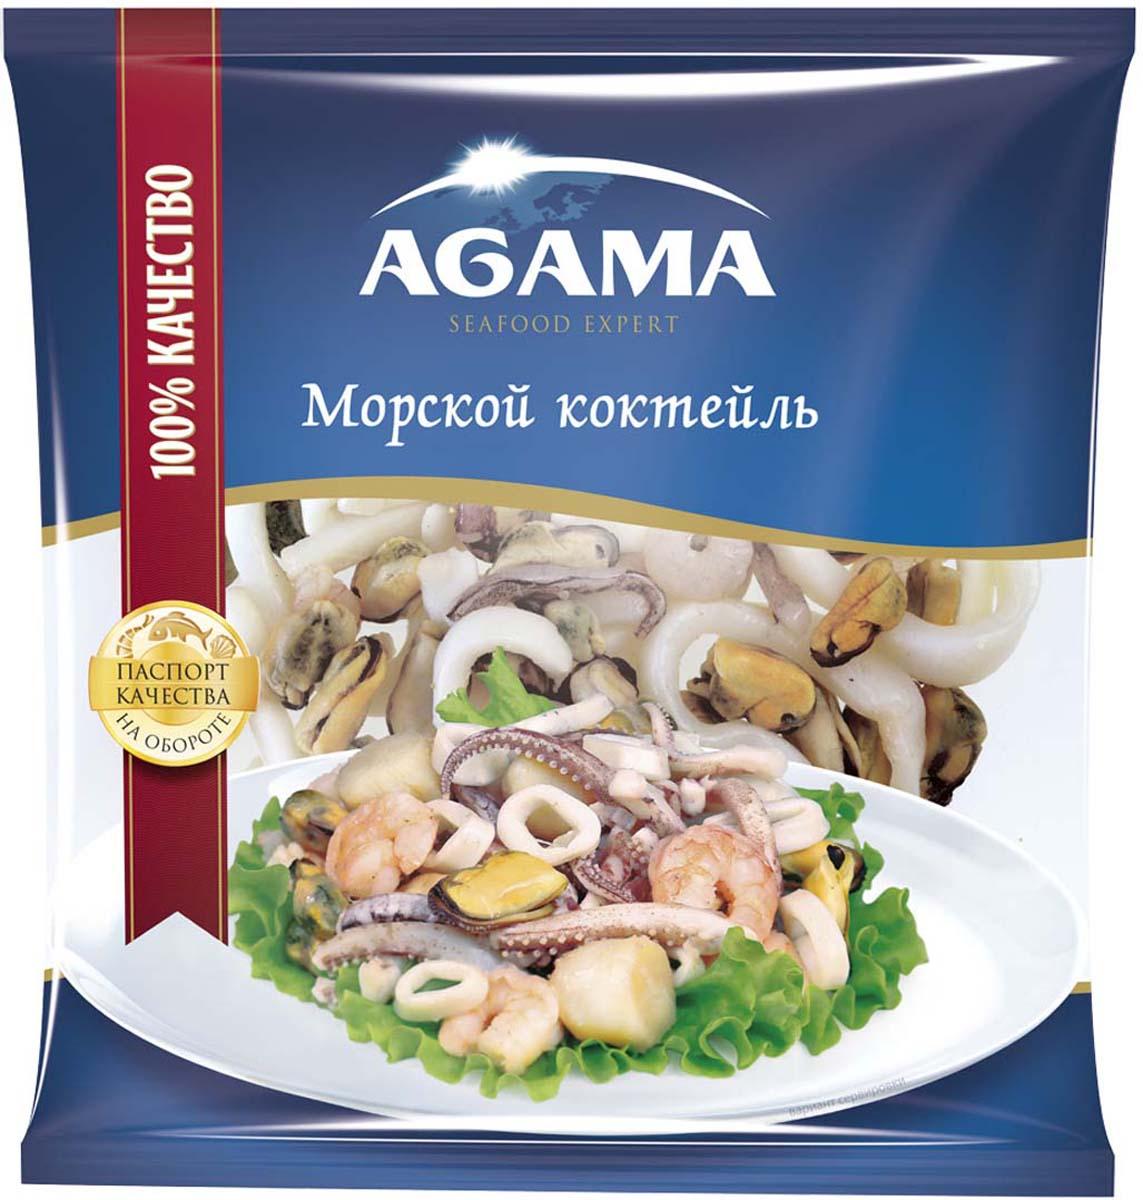 AgamaМорской коктейль, сыромороженый, 300 г Agama